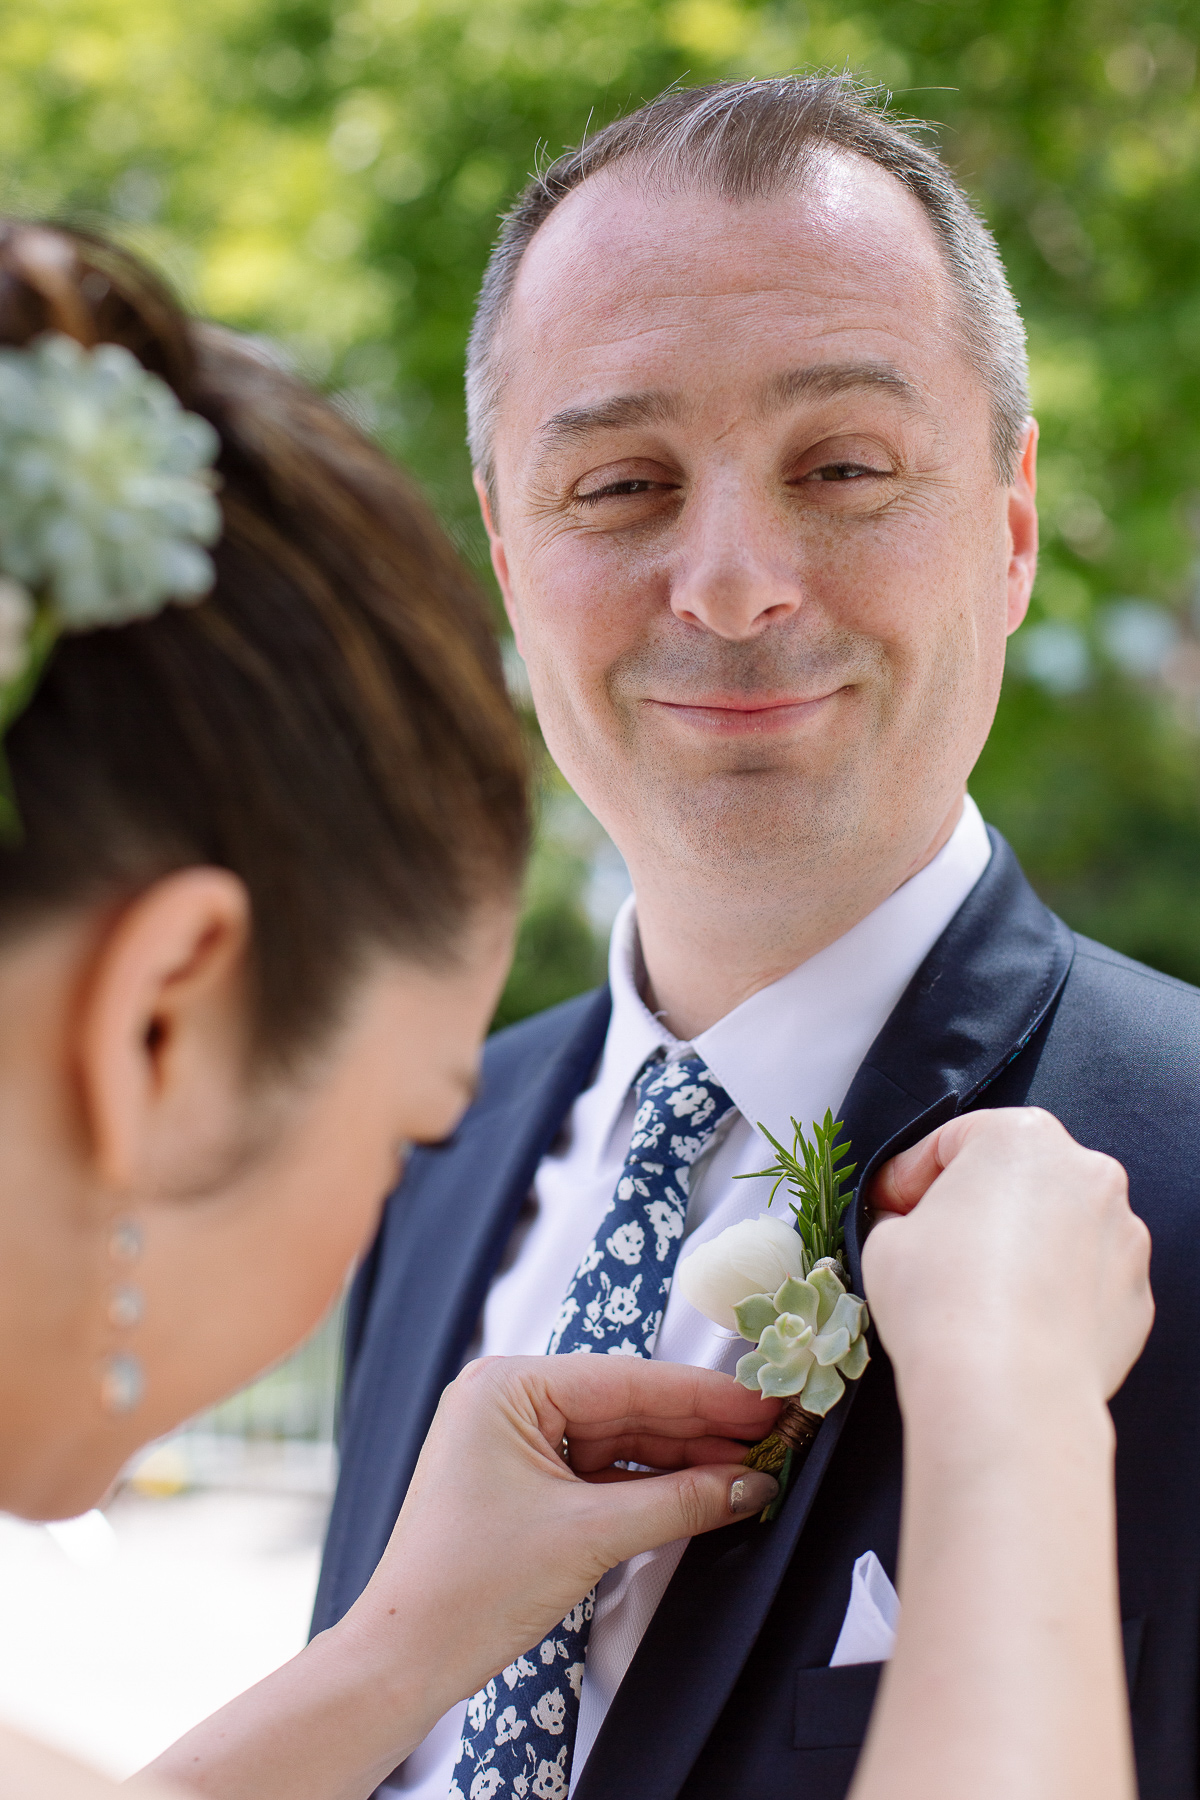 gantry state plaza long island city wedding photographer